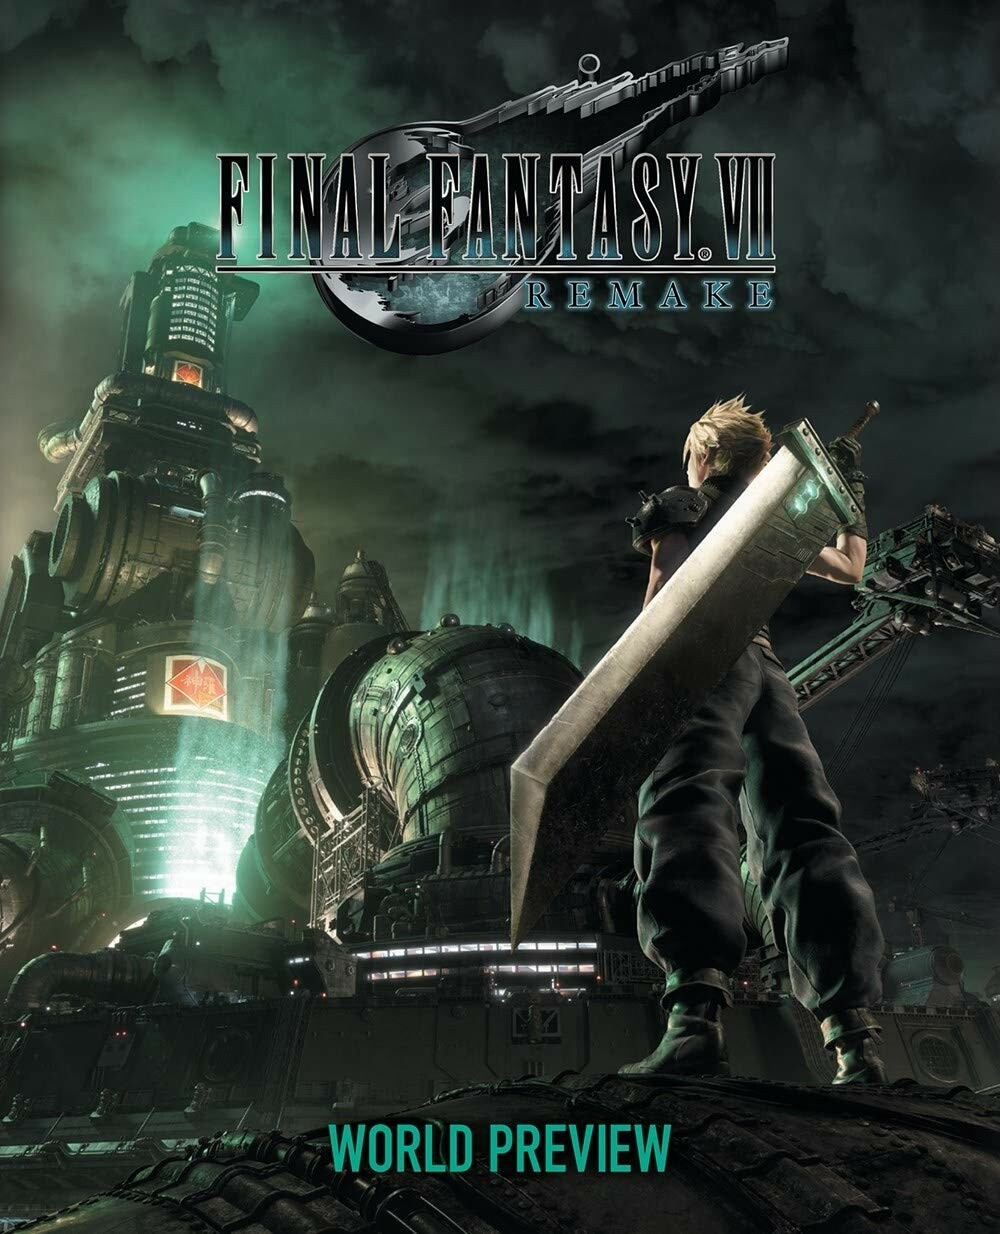 Final Fantasy VII Remake: World Preview - English Localization